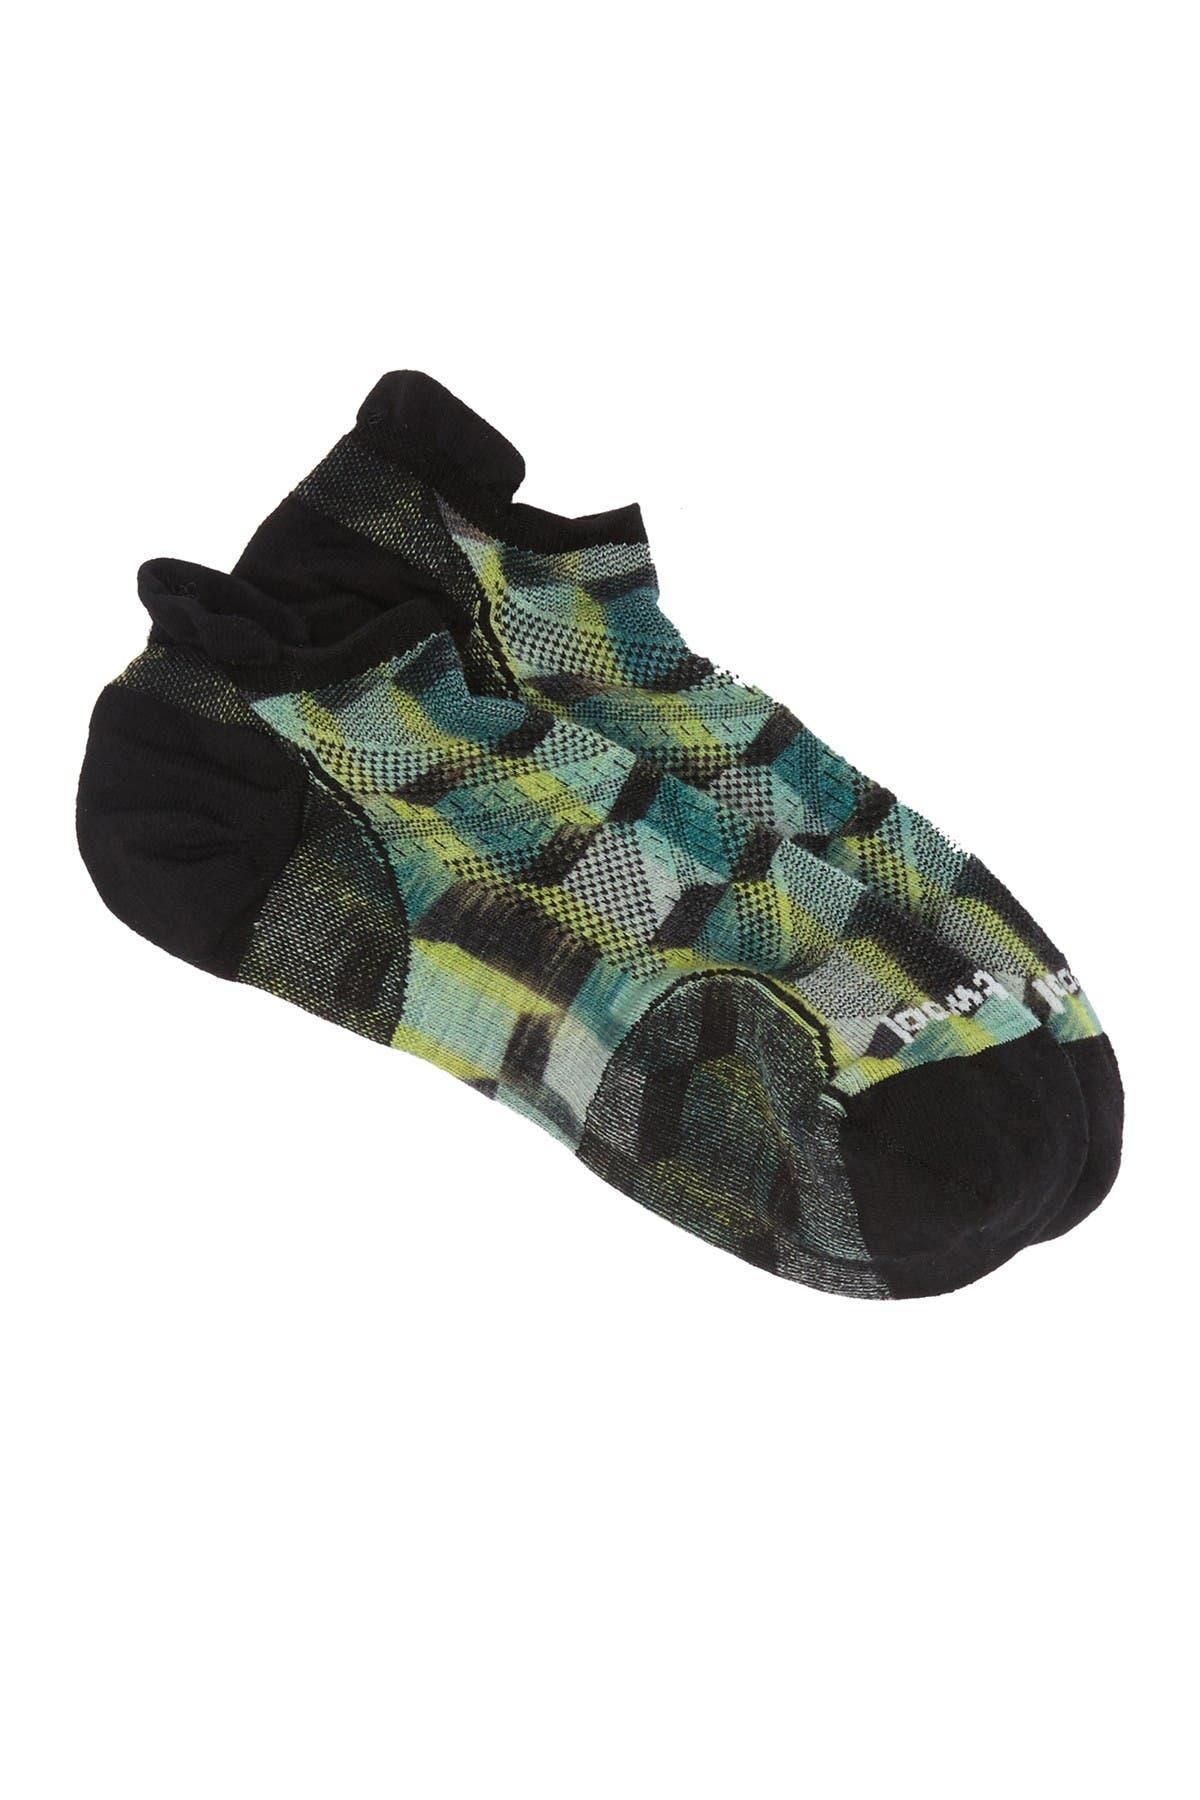 Image of SmartWool PhD Run Ultra Light Micro Socks